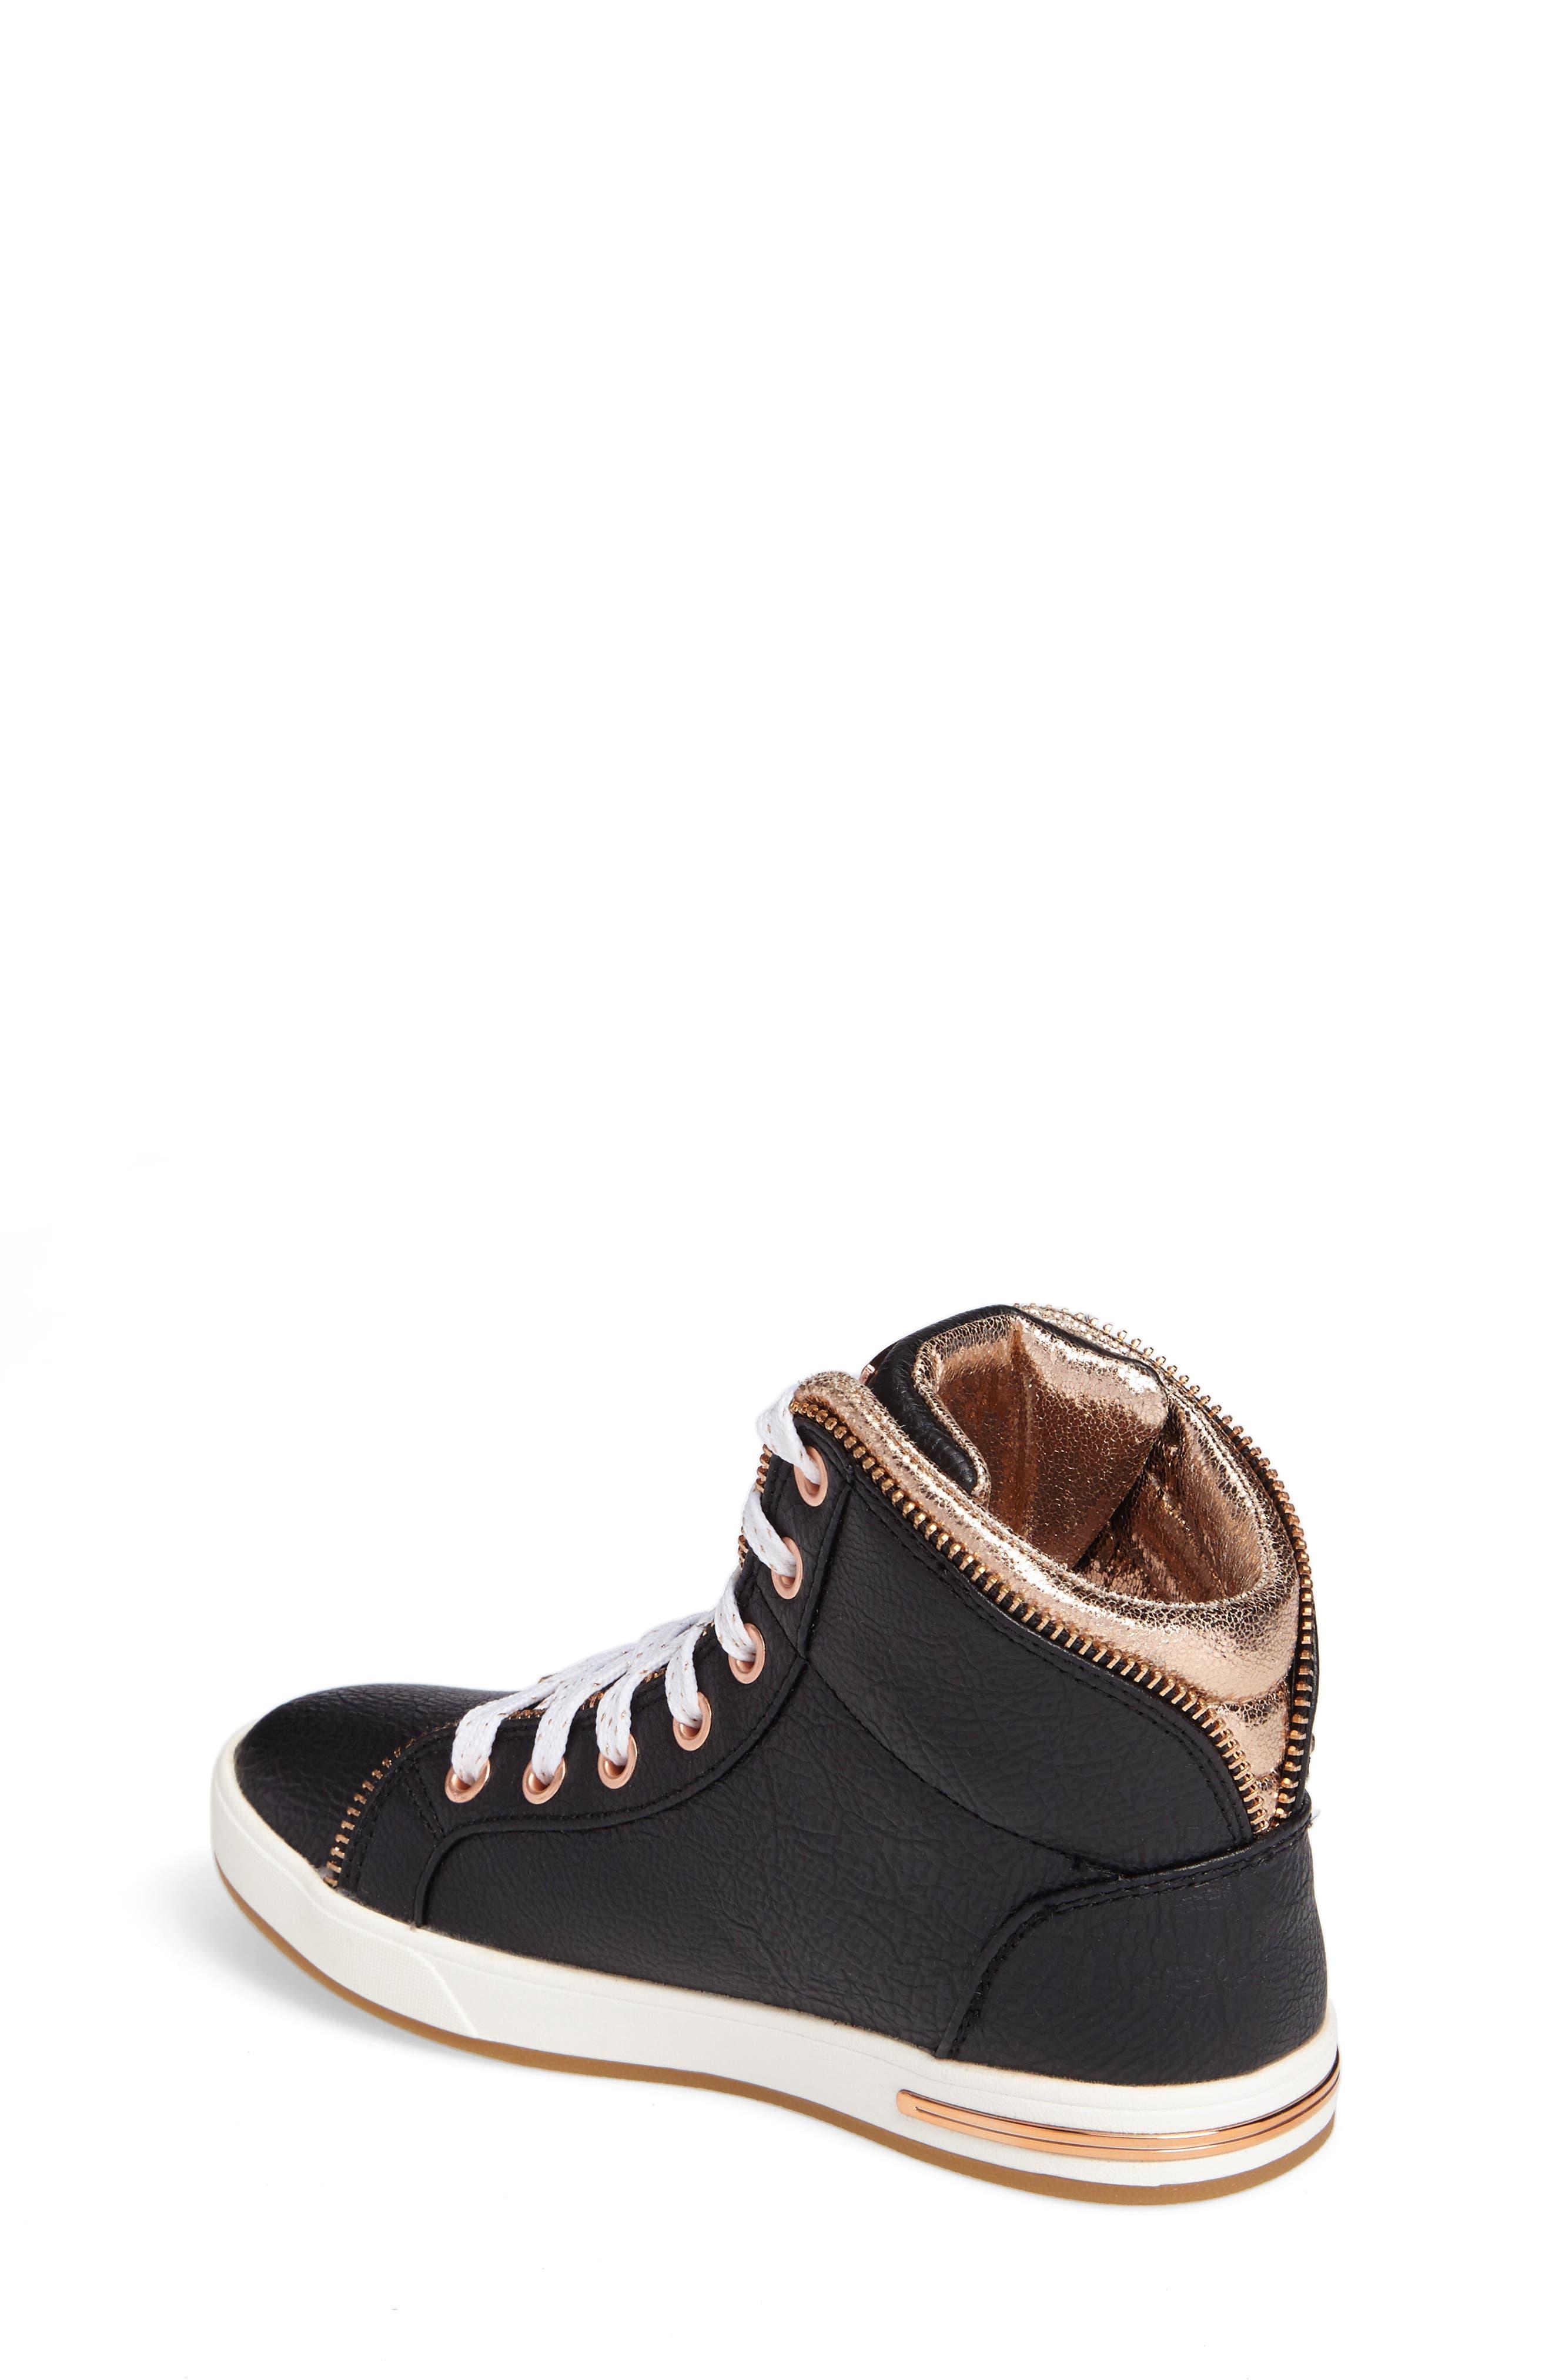 Shoutouts Embellished High Top Sneaker,                             Alternate thumbnail 2, color,                             001